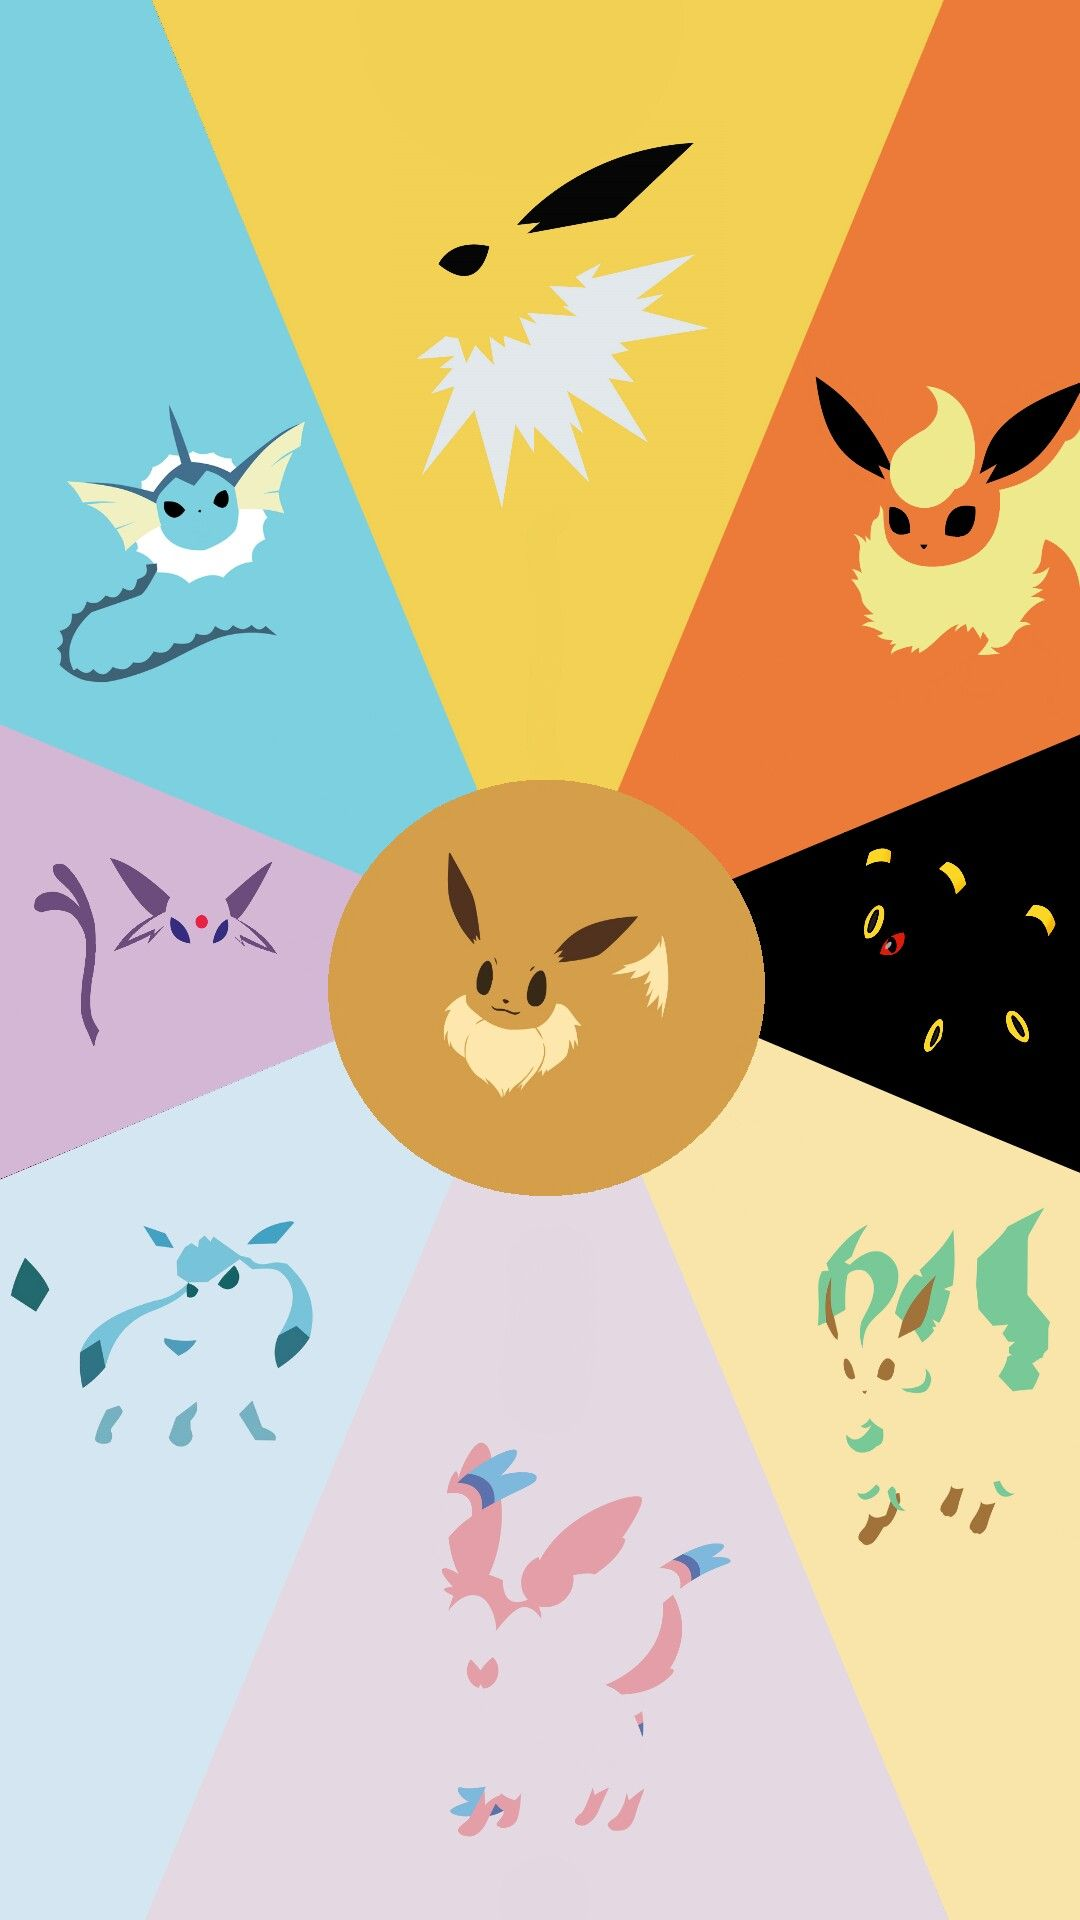 Pin by Vick Crecchi on Lock screen Pinterest Pokémon